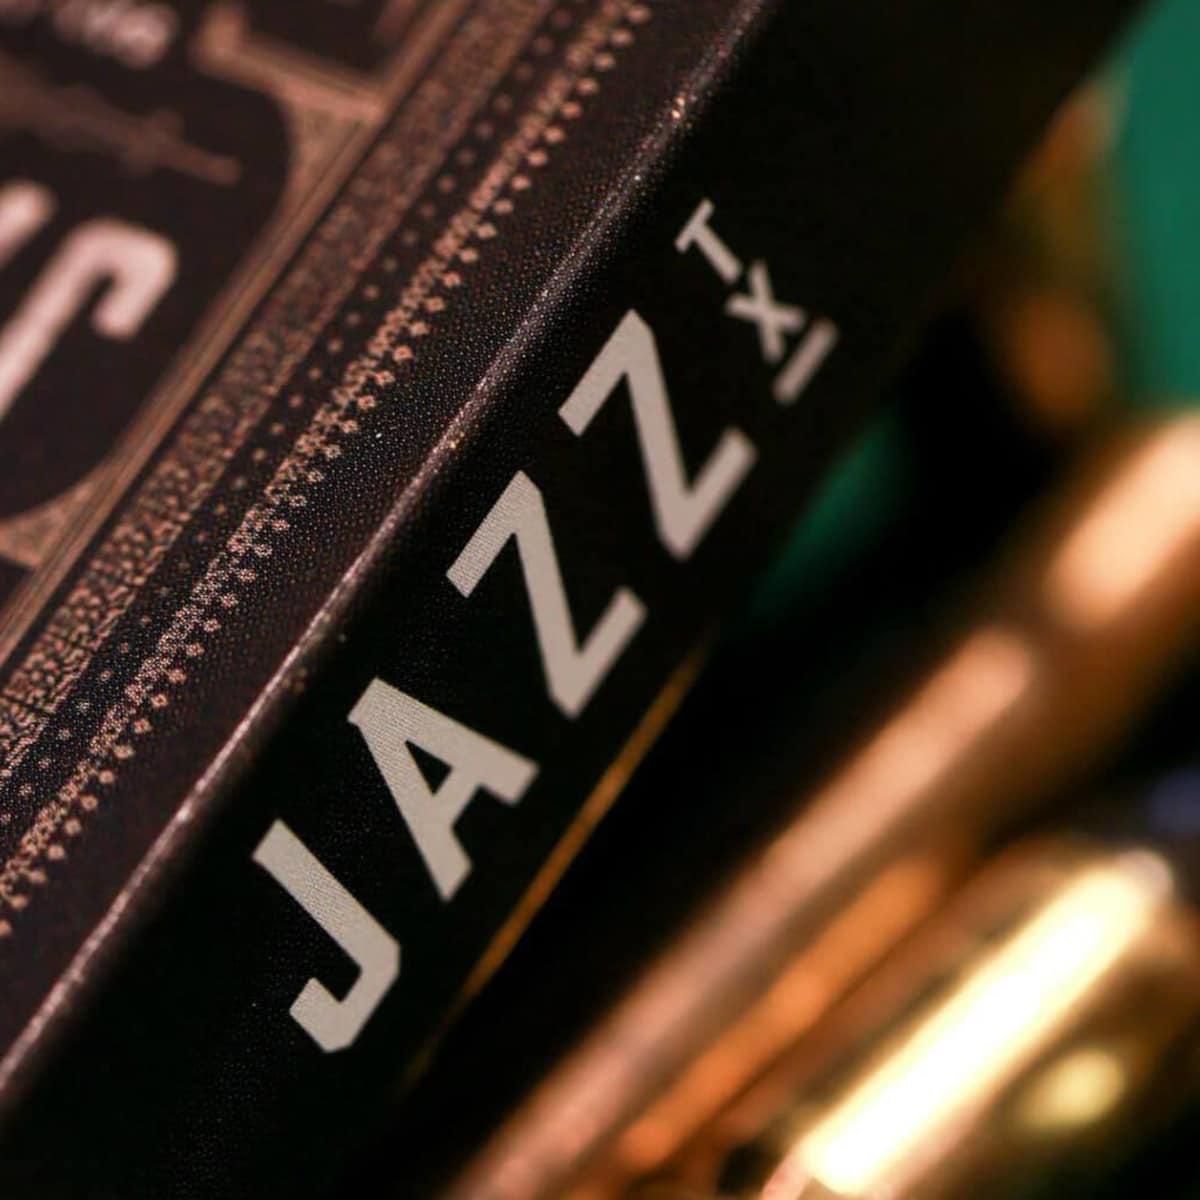 Jazz, TX San Antonio music venue